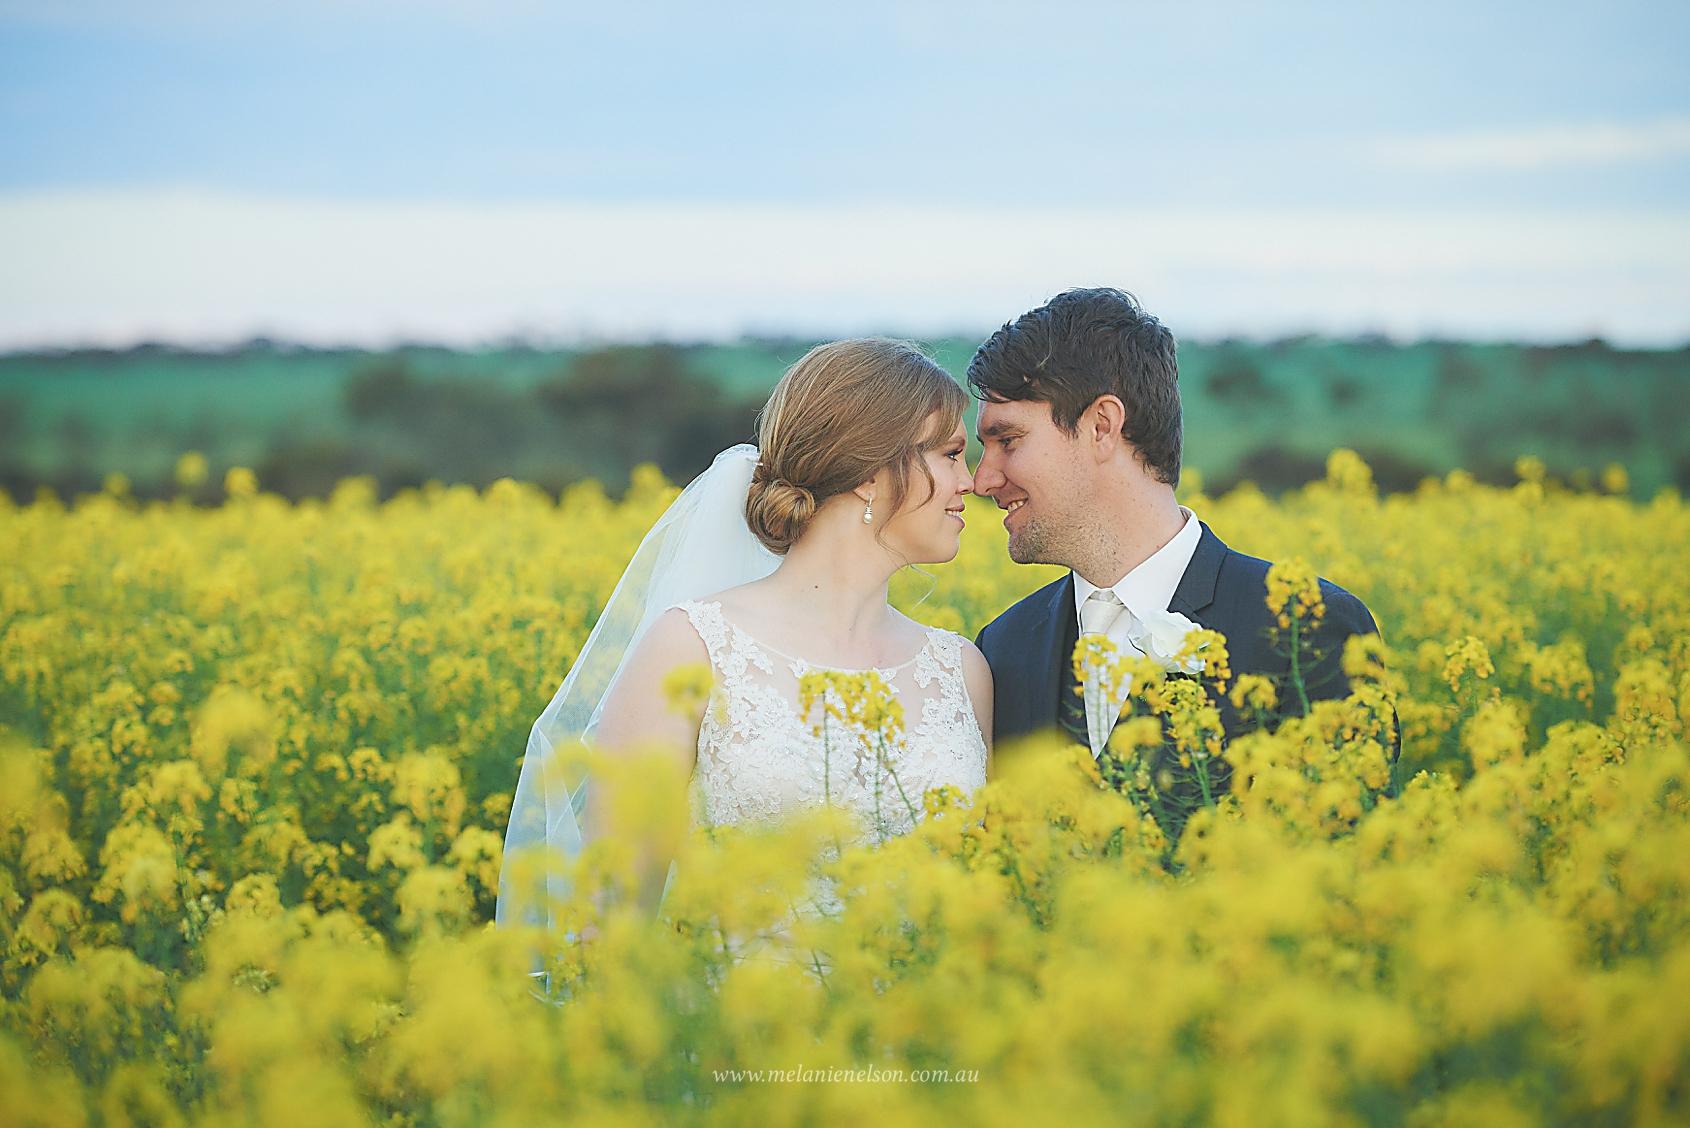 yorke_peninsula_wedding_photographer_0087.jpg